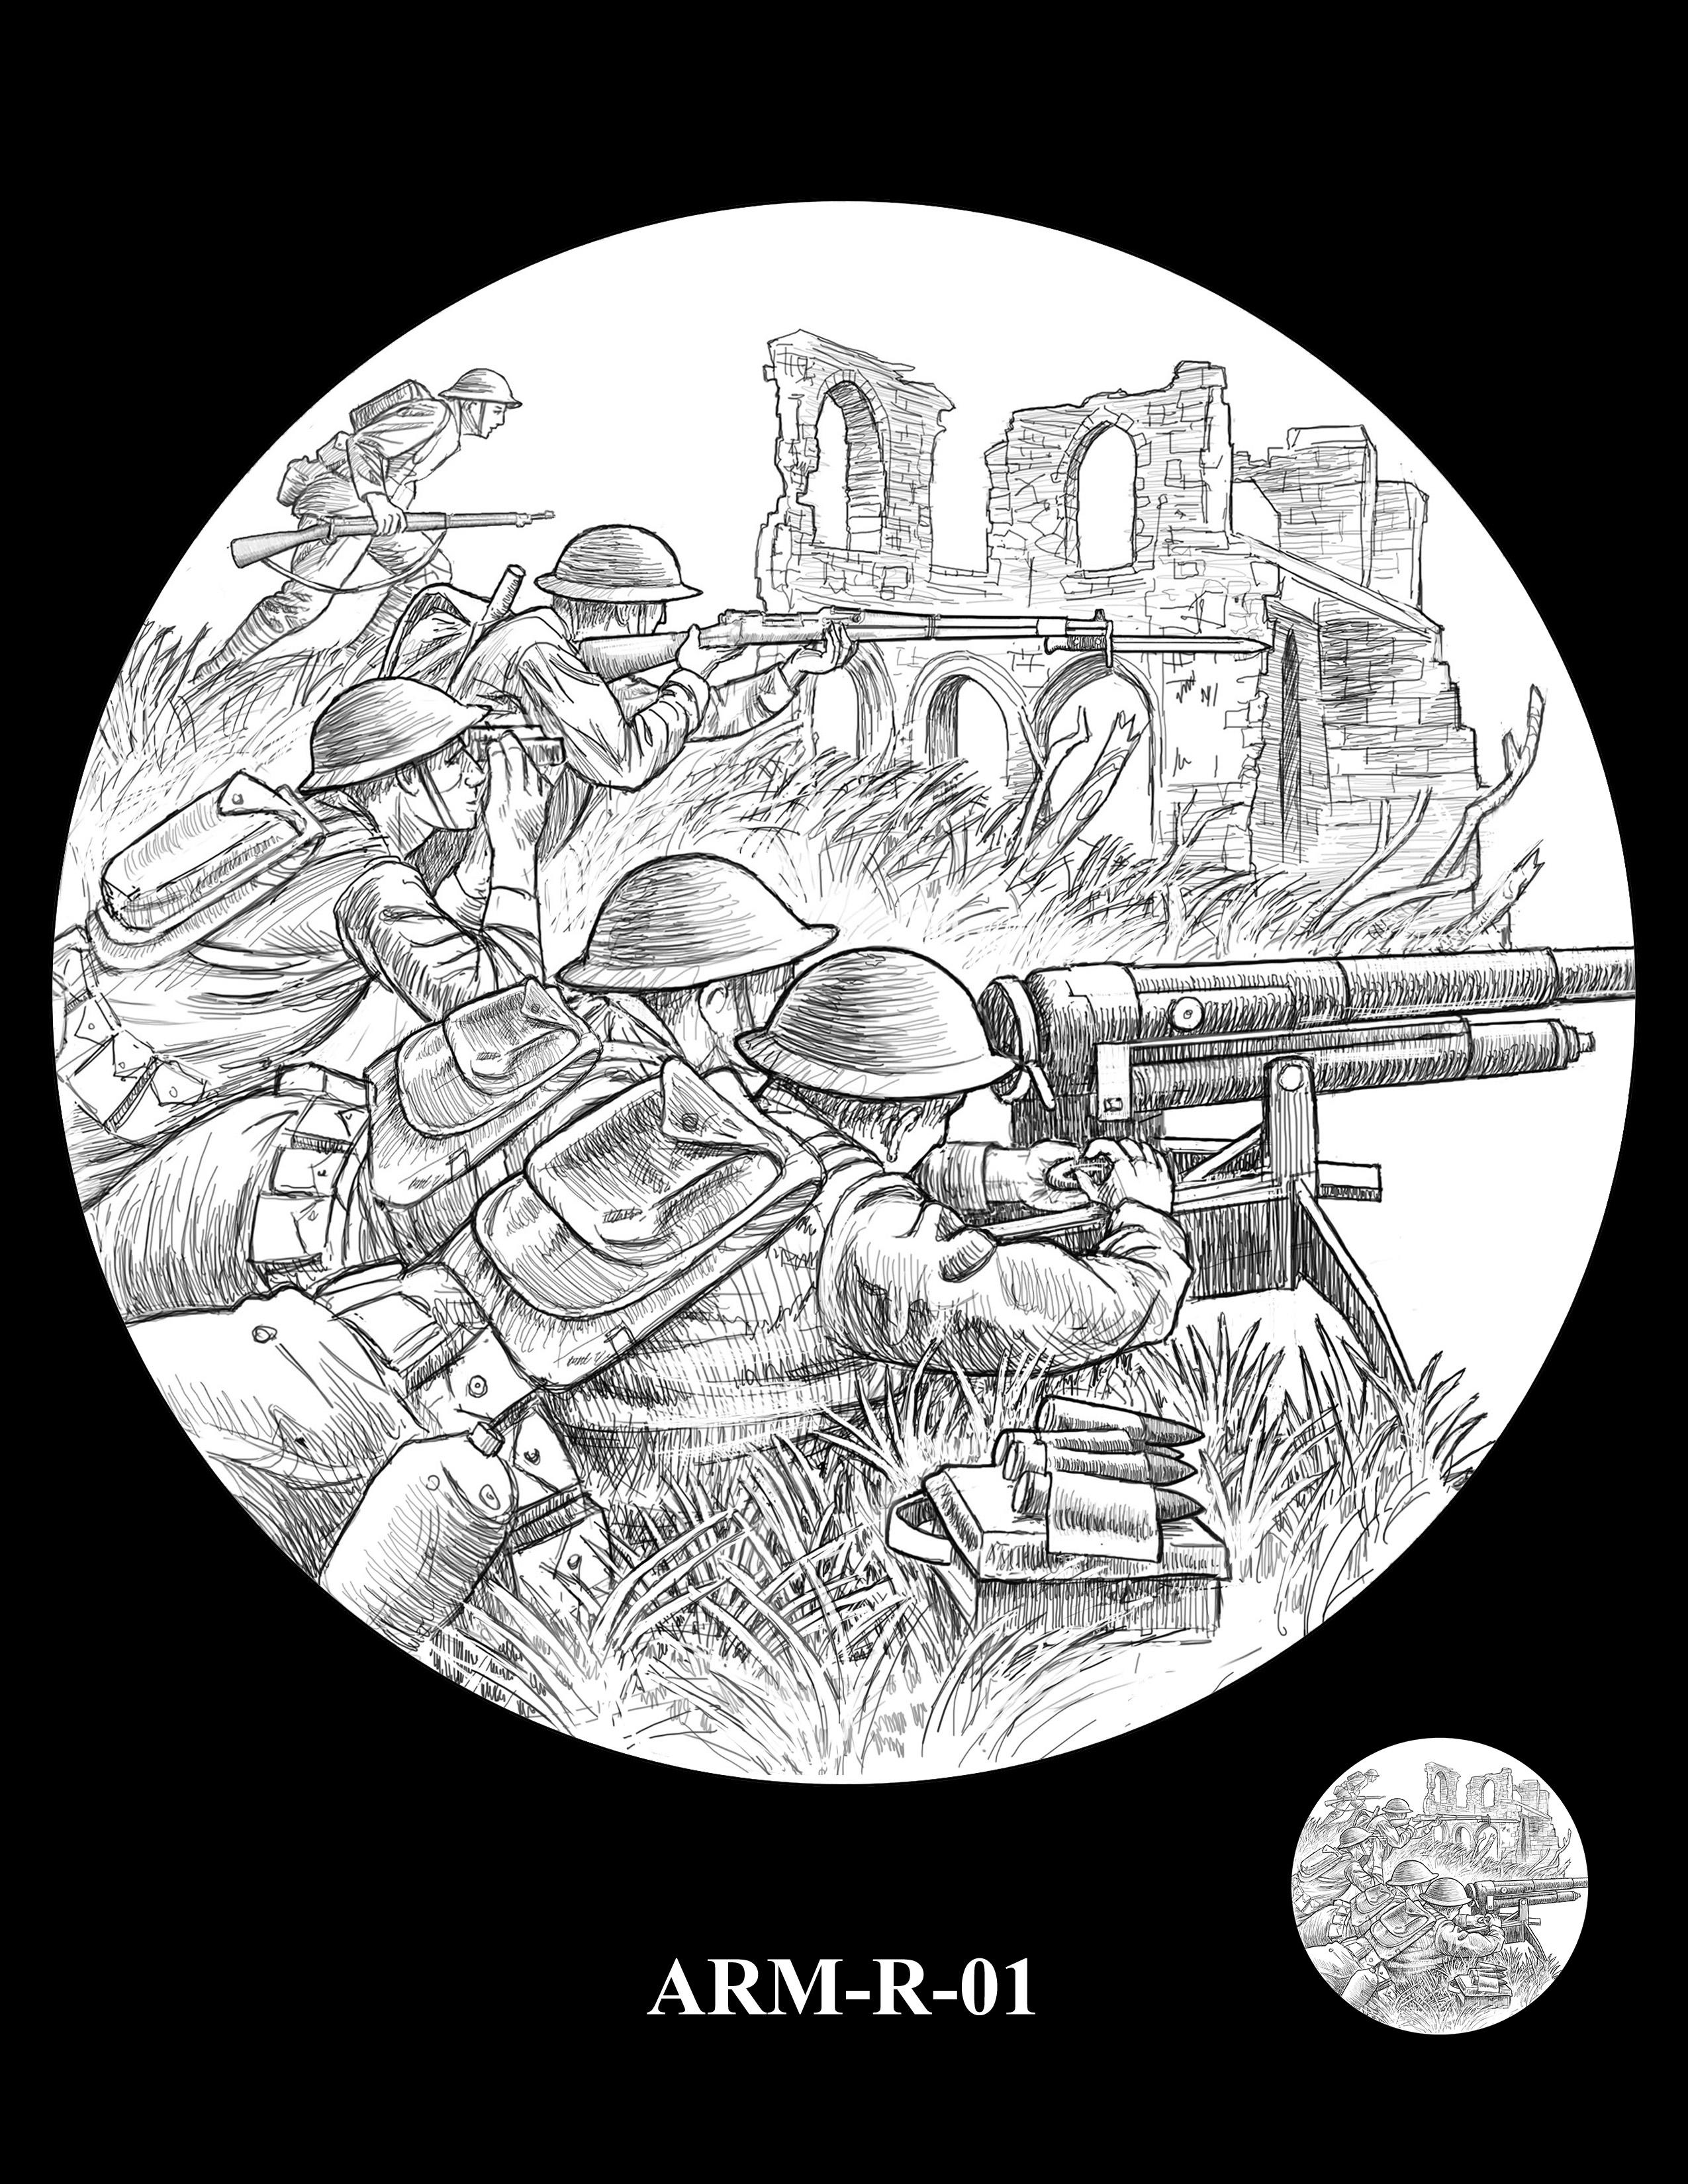 P1-ARM-R-01 --2018-World War I Silver Medals - Army